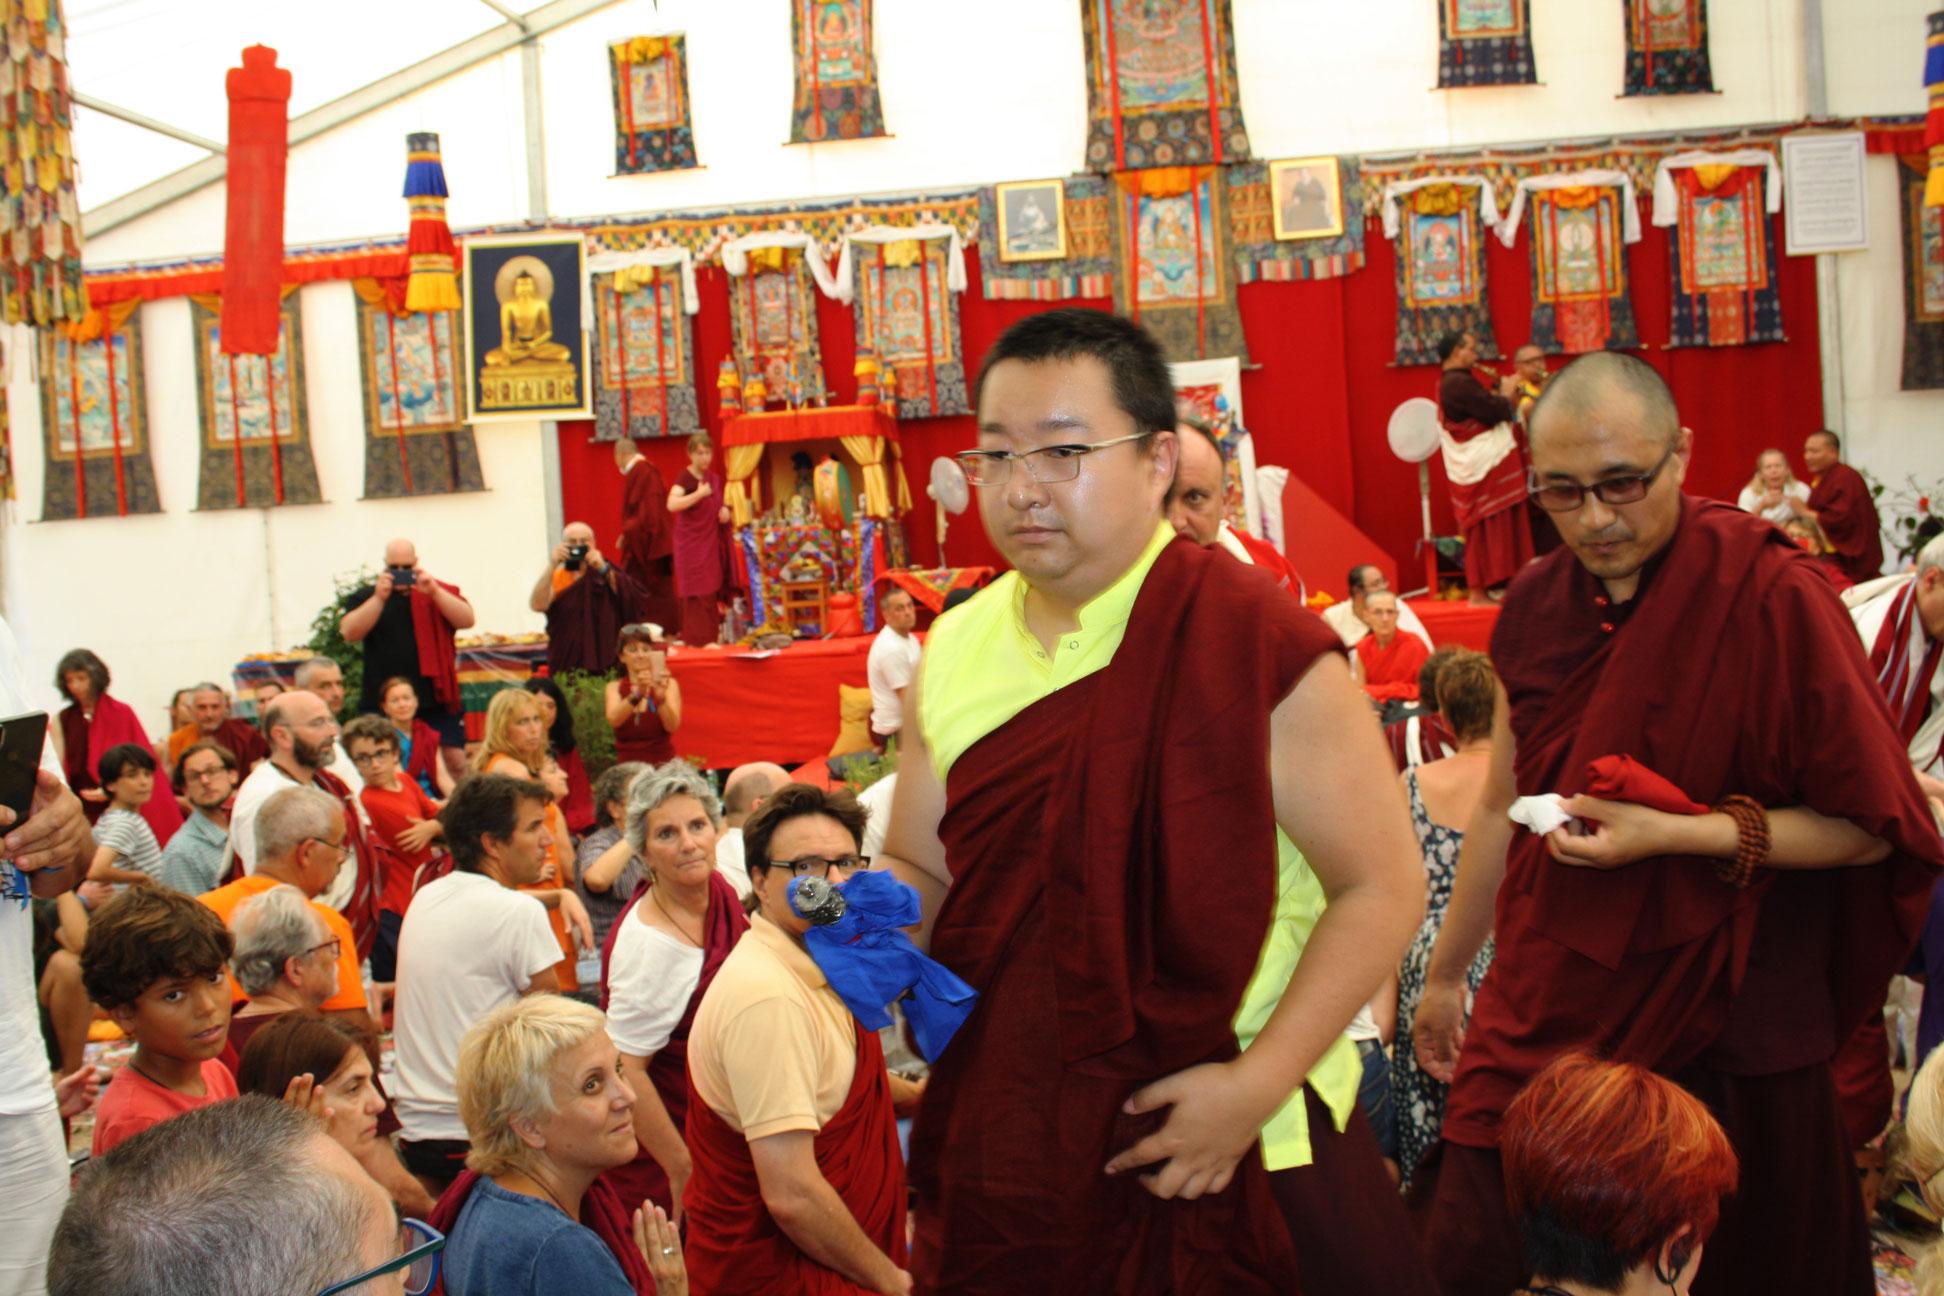 SS-Dudjom-Rinpoche-Sangye-Pema-Zhepa-evento-valencia-julio-2019-9